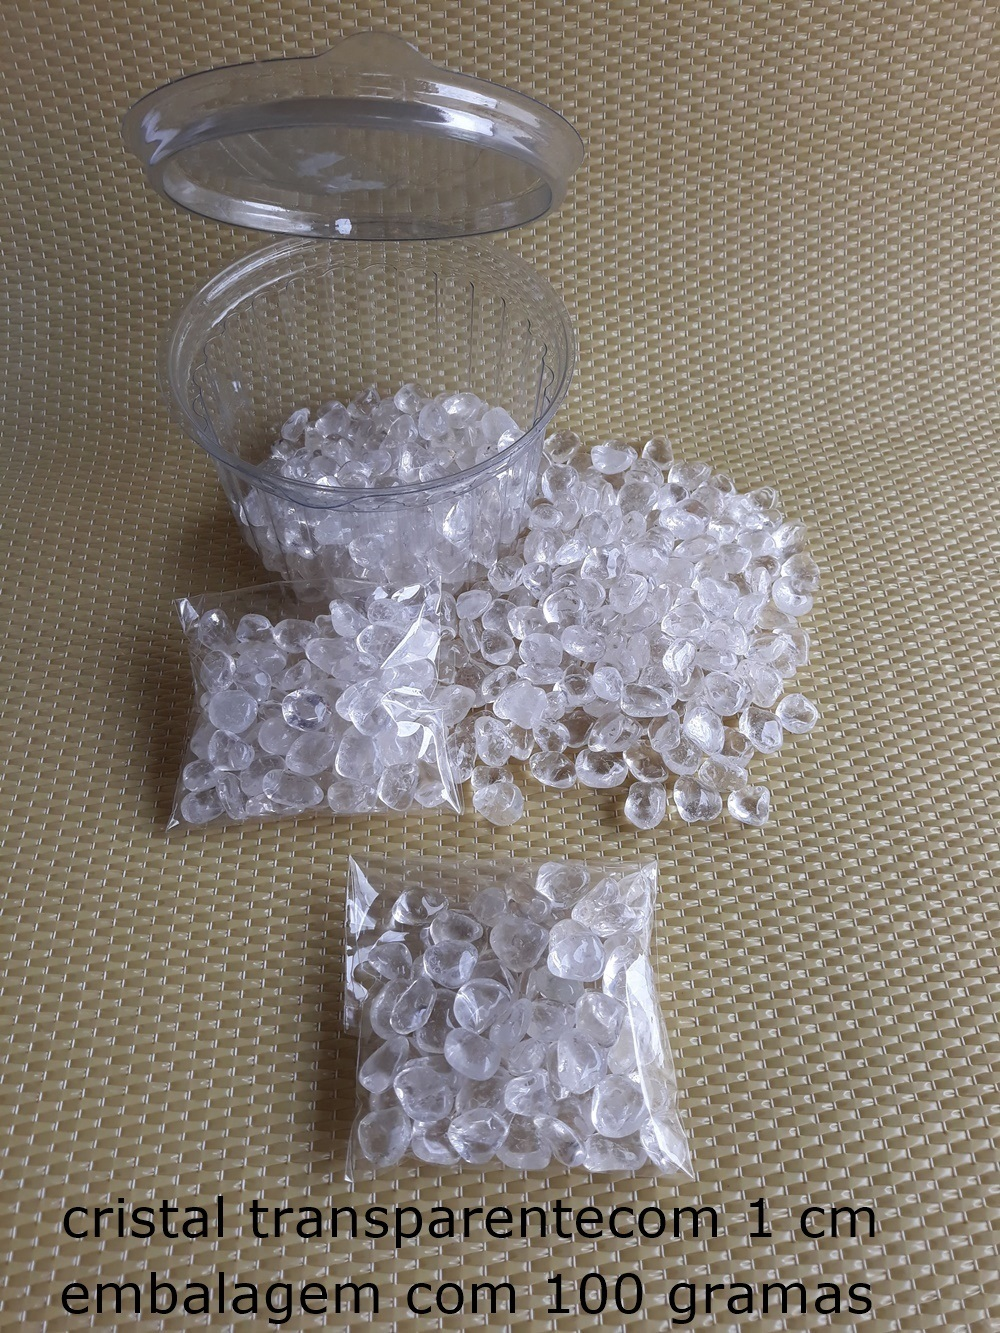 Cristal Transparente/ Grades de Cristais/  100 gramas